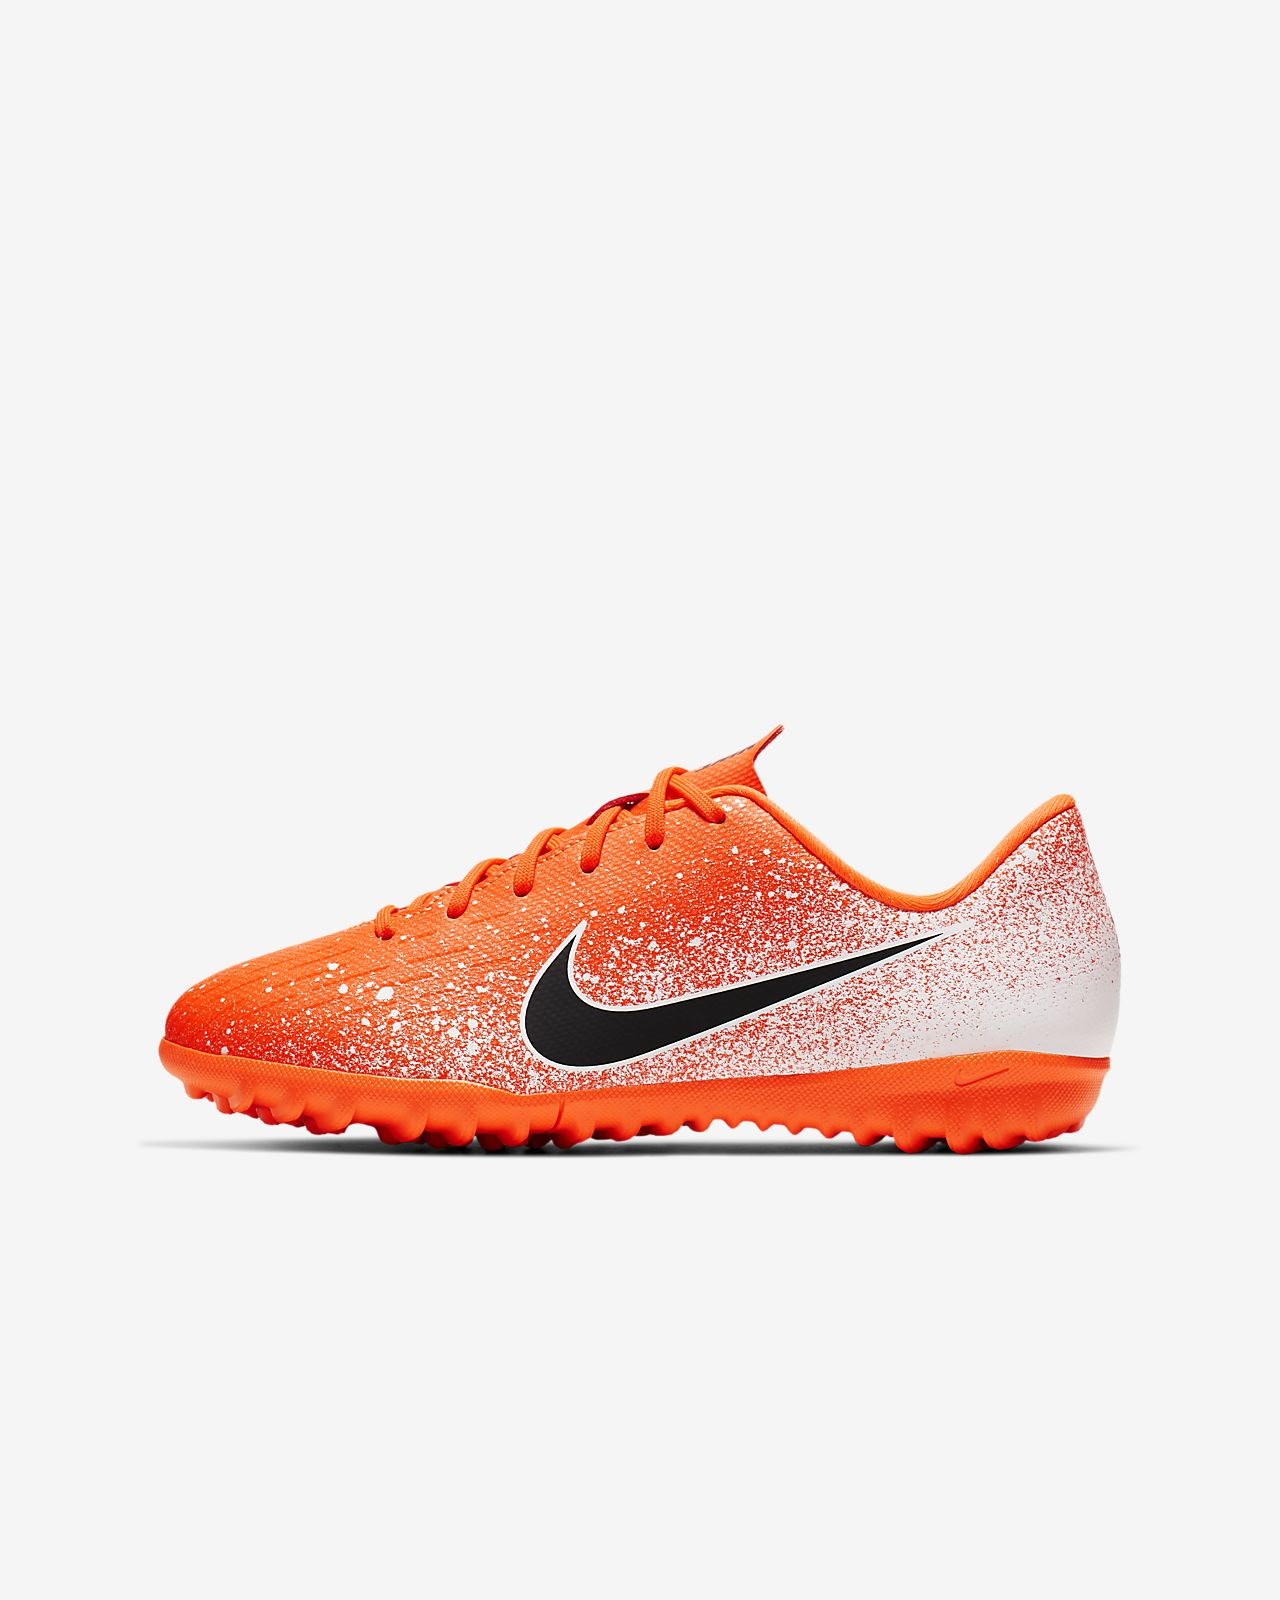 126b149201017 ... Nike Jr. Vapor 12 Academy TF Botas de fútbol para moqueta - Turf - Niño